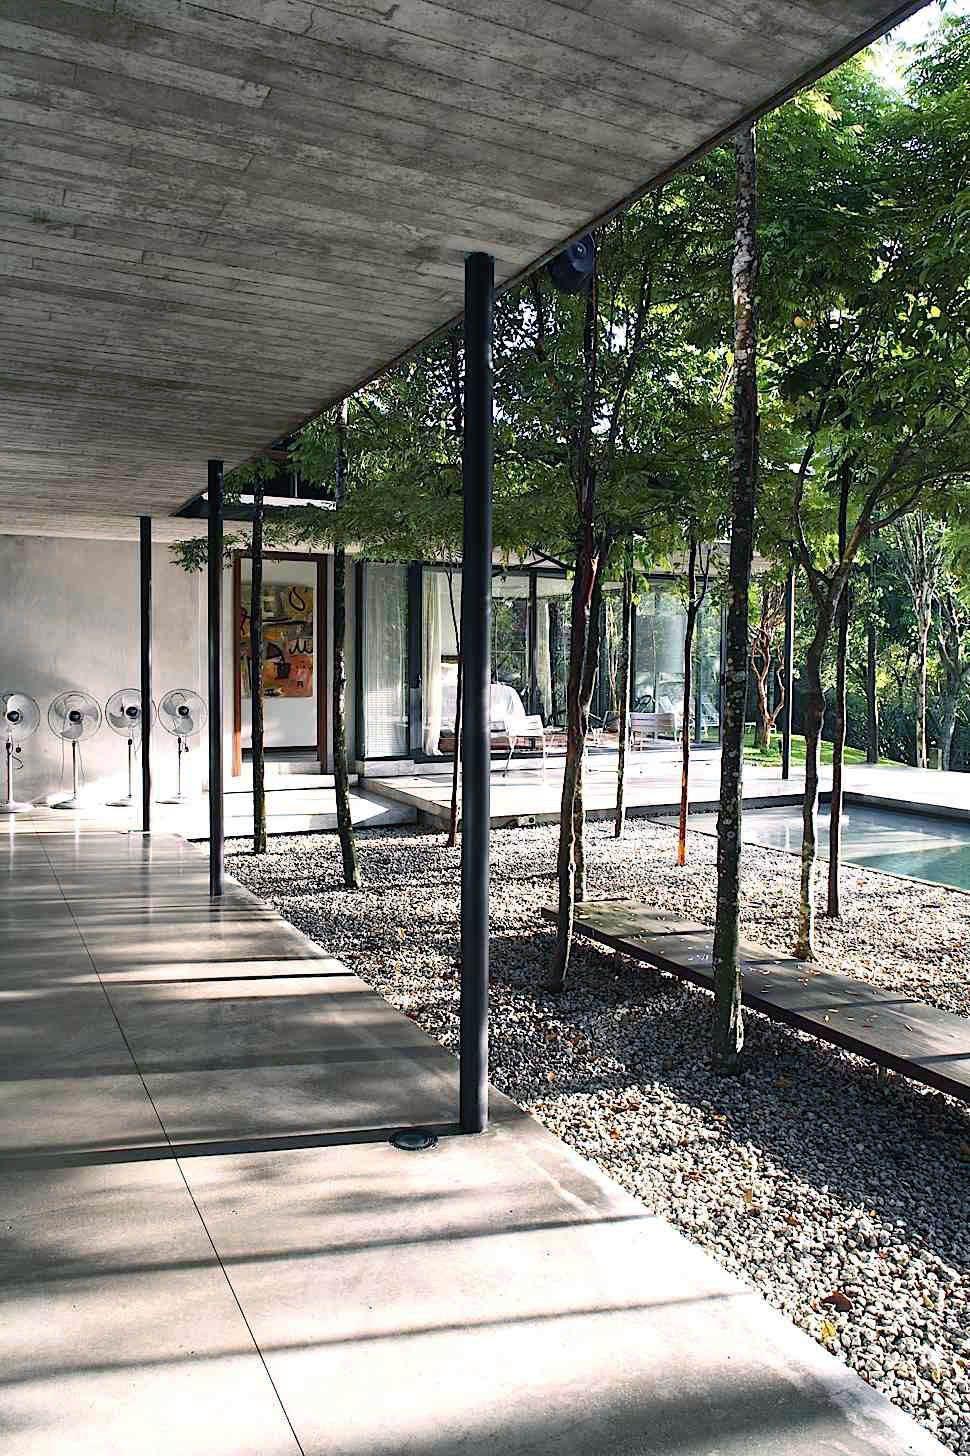 20 Various Ways To Design Your Backyard With An Outdoor